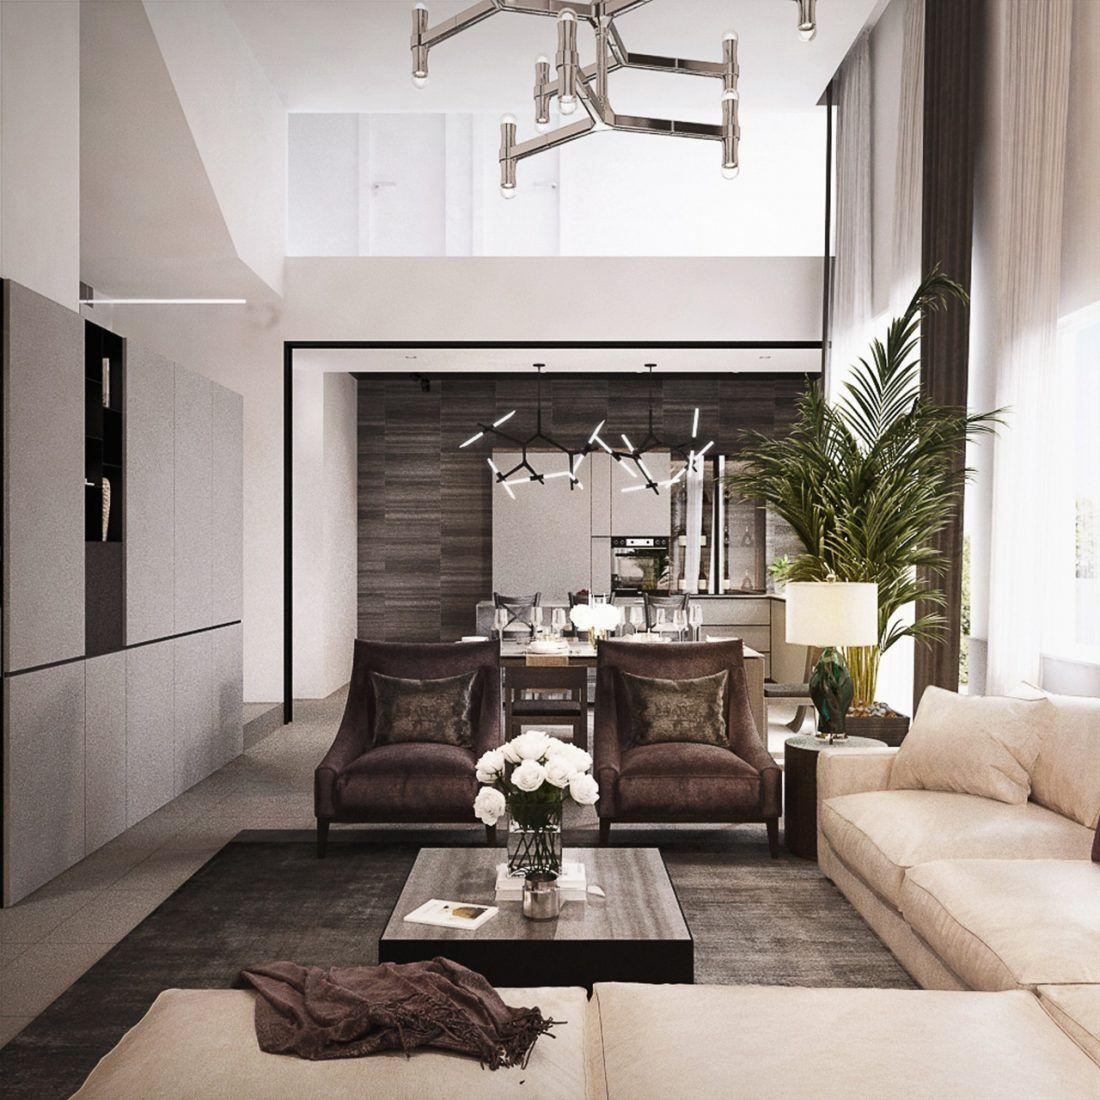 55 Reference Of Living Room Interior Design Pdf In 2020 Interior Design Apartment Small Small Apartment Interior Small Space Interior Design